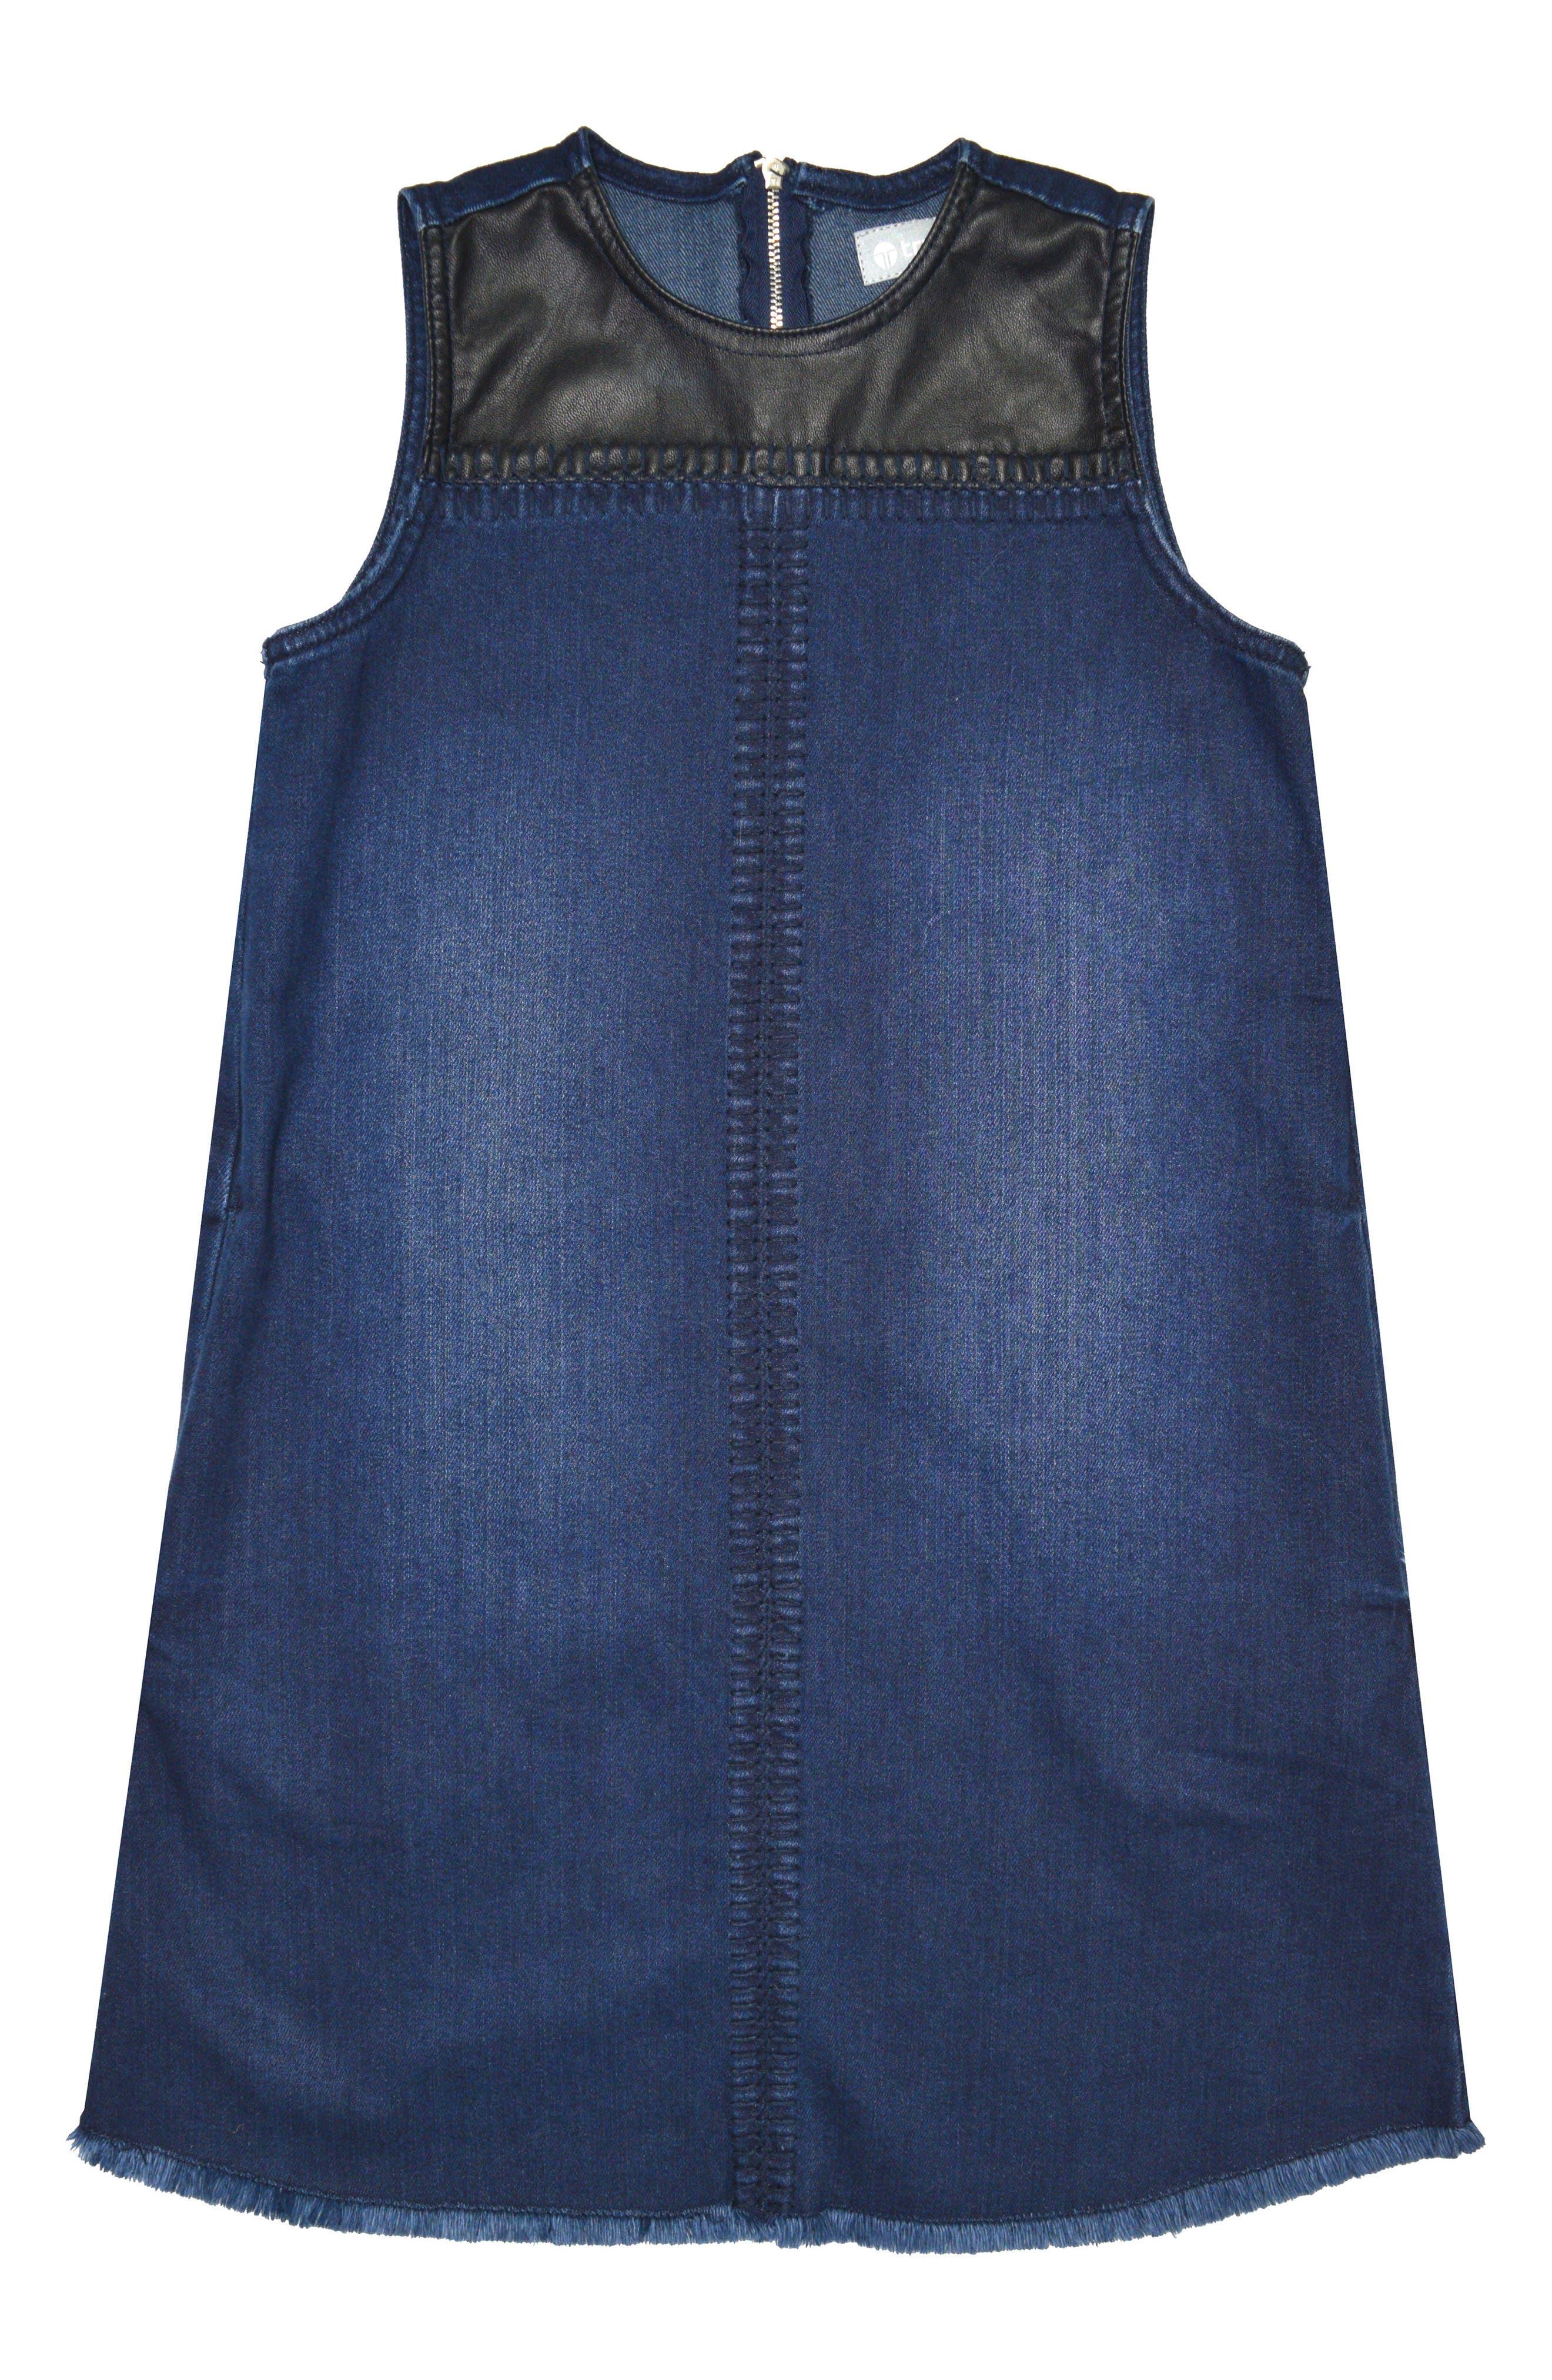 Tractr Faux Leather Yoke Denim Dress (Big Girls)